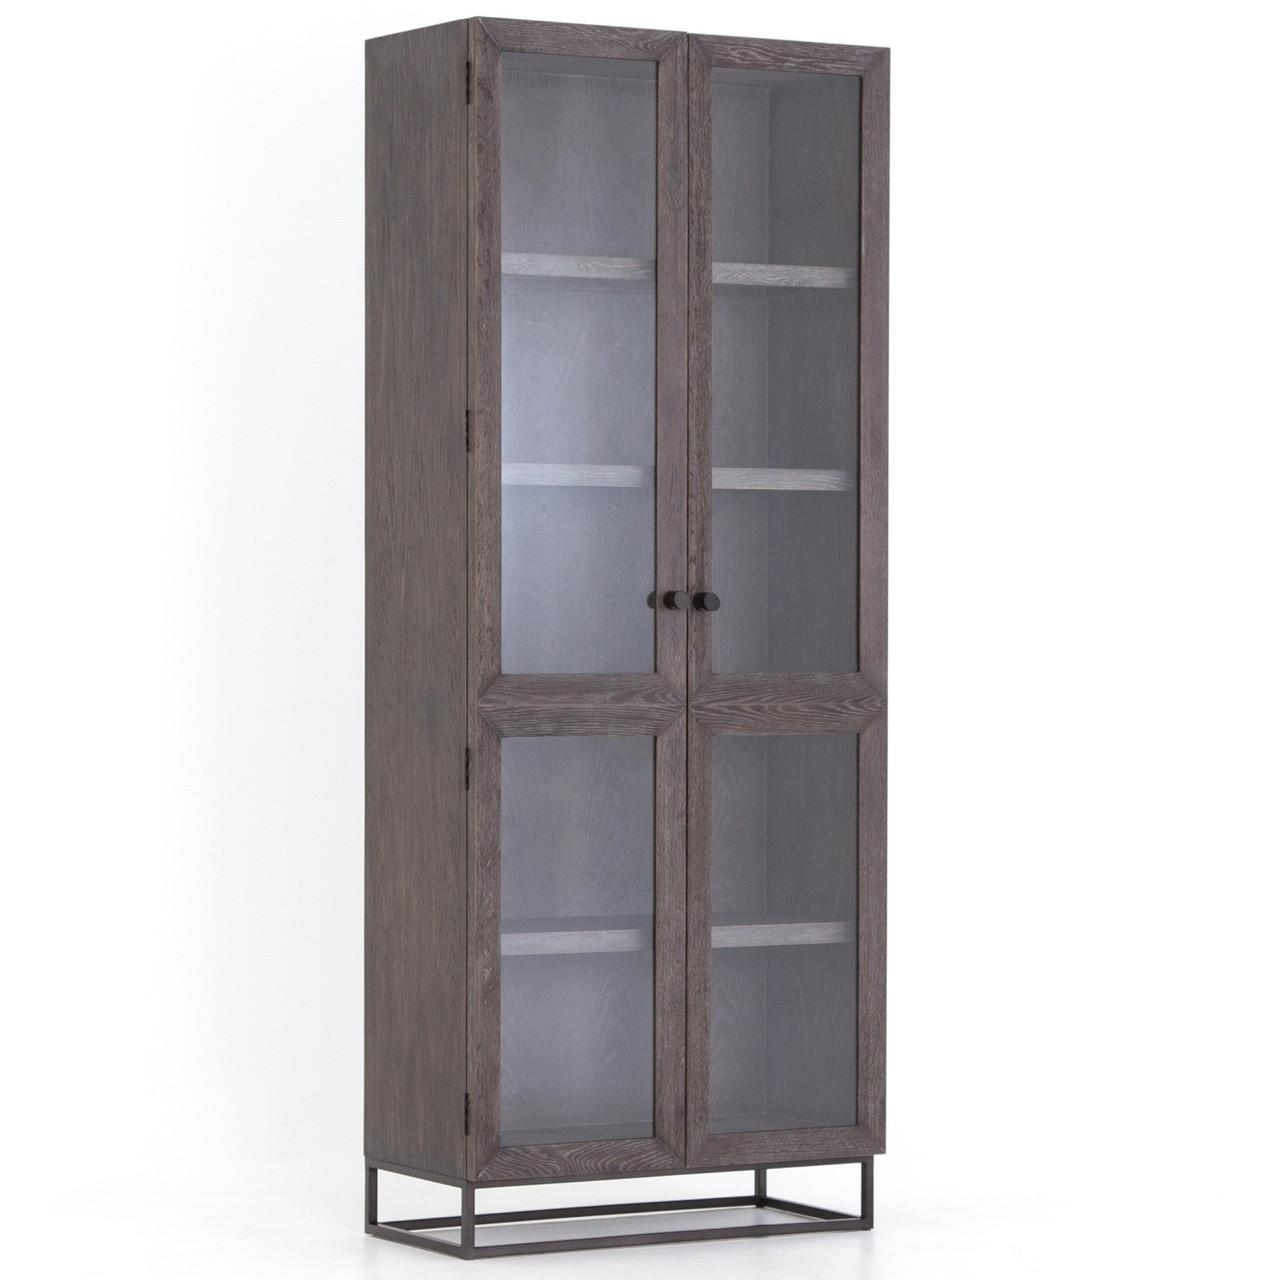 Garner Aged Oak Wood Glass Door Tall Display Cabinet